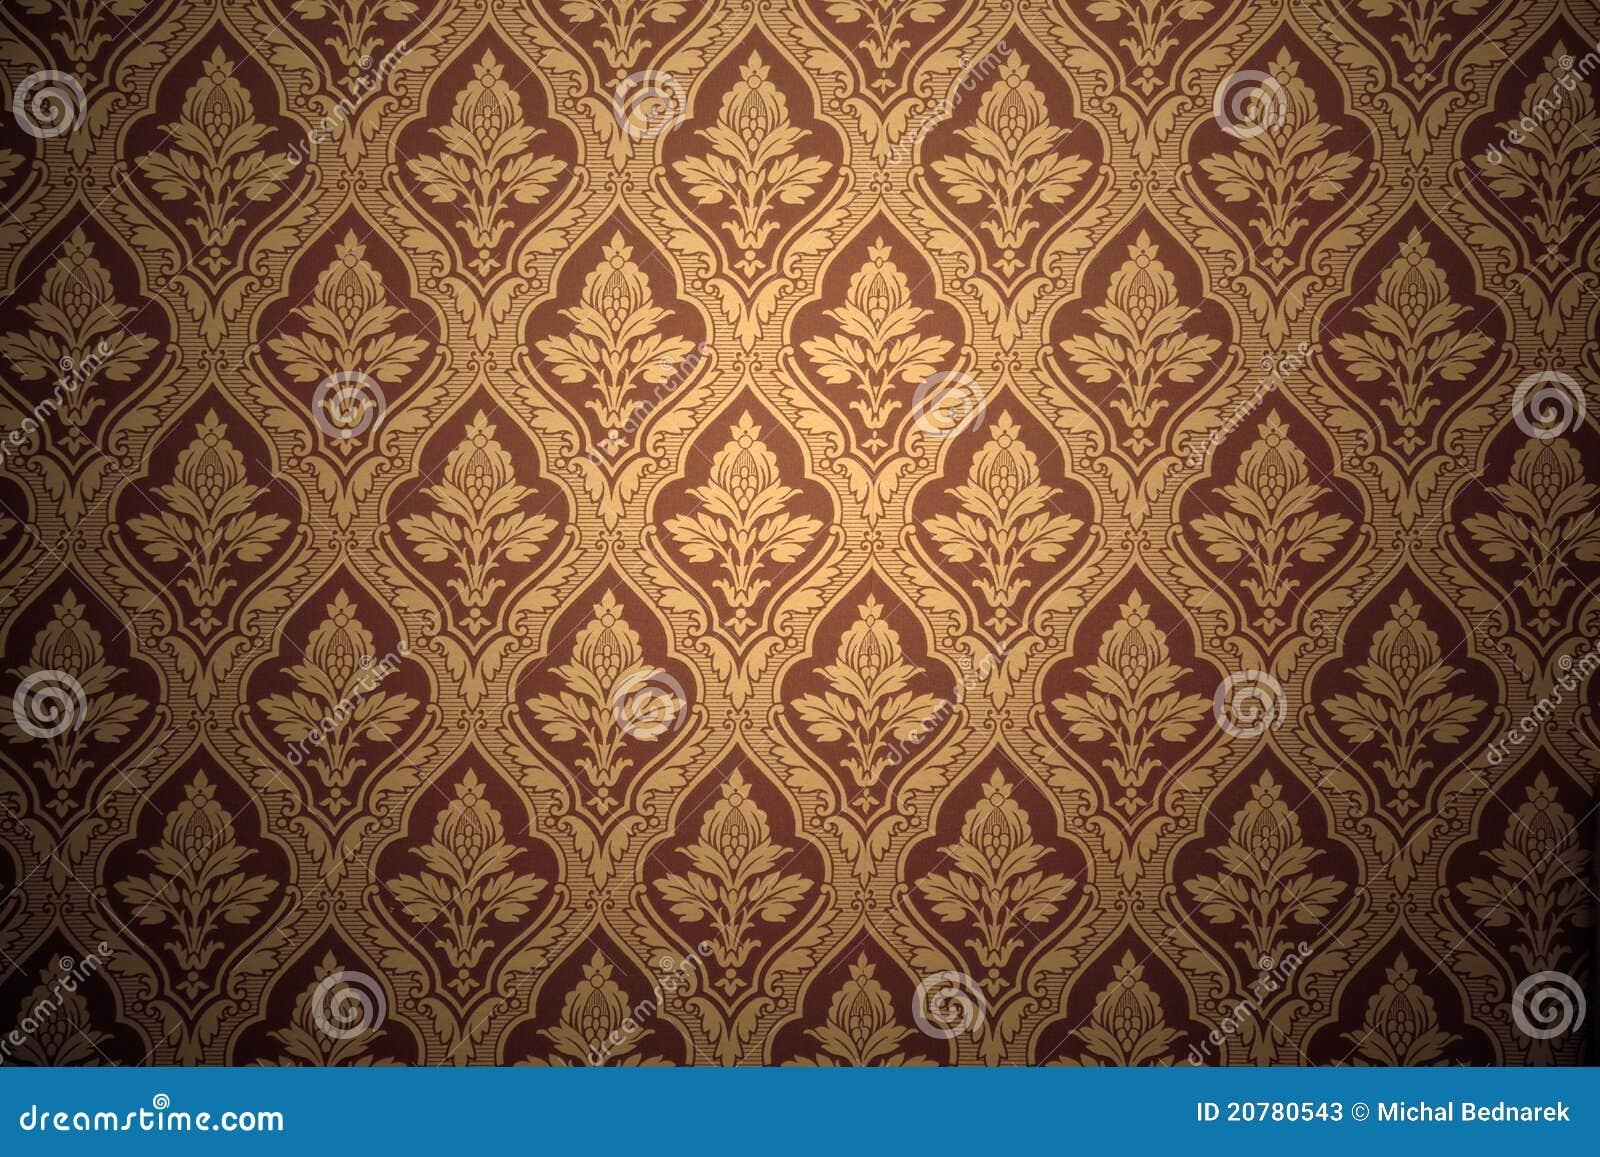 Alte retro tapete im sepia stockfotos bild 20780543 - Papel de pared retro ...